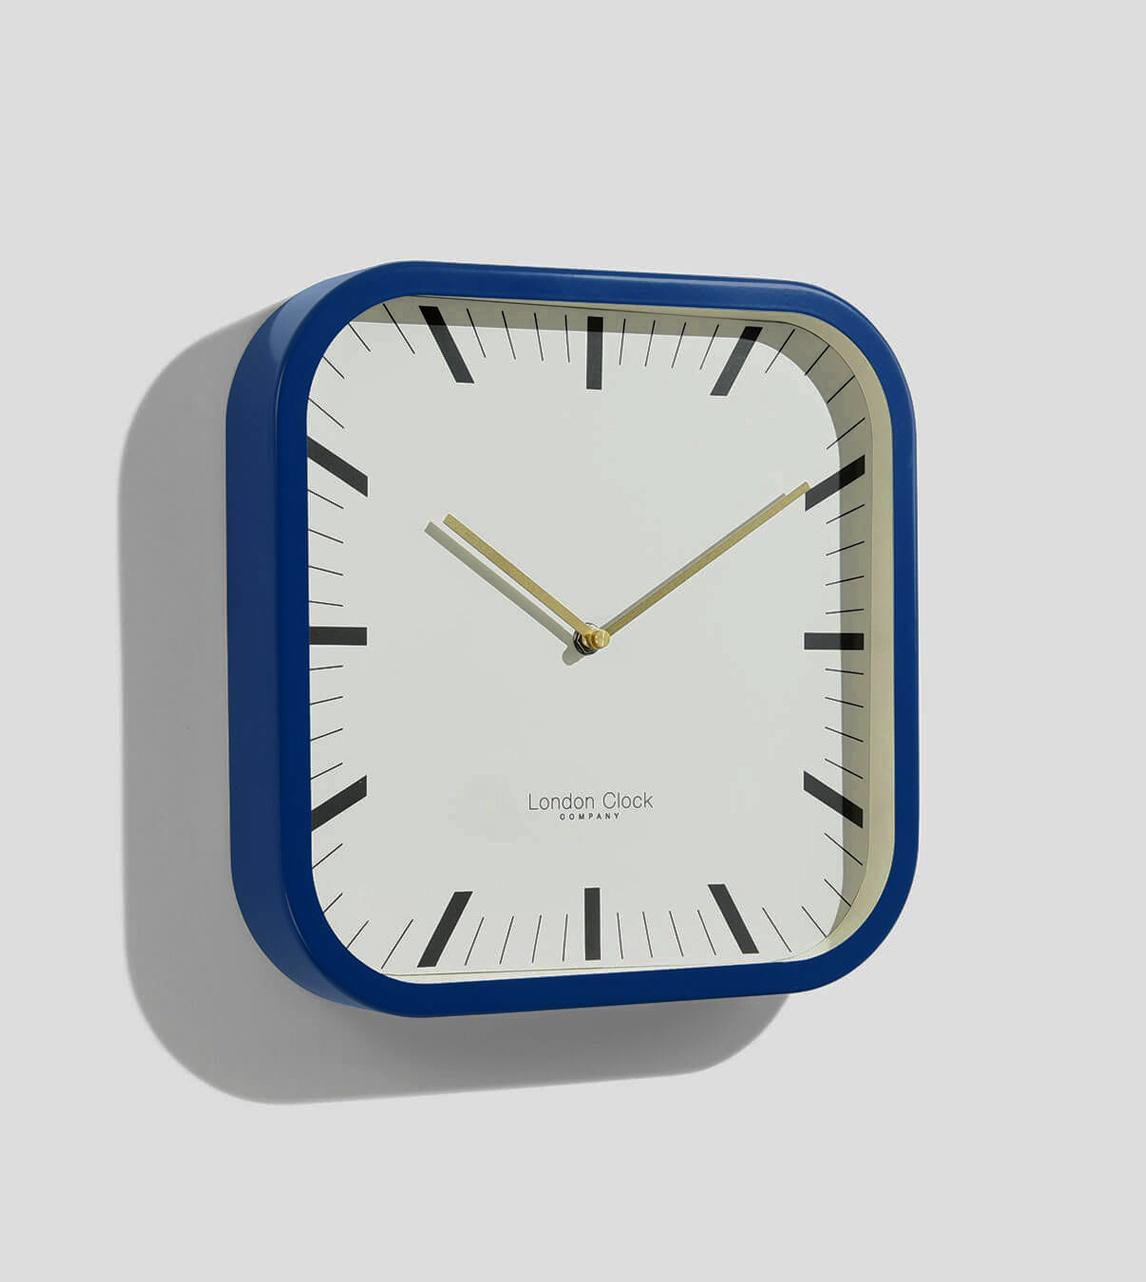 London Clock Square Wall Clock Navy Blue London Clock Company Swoon